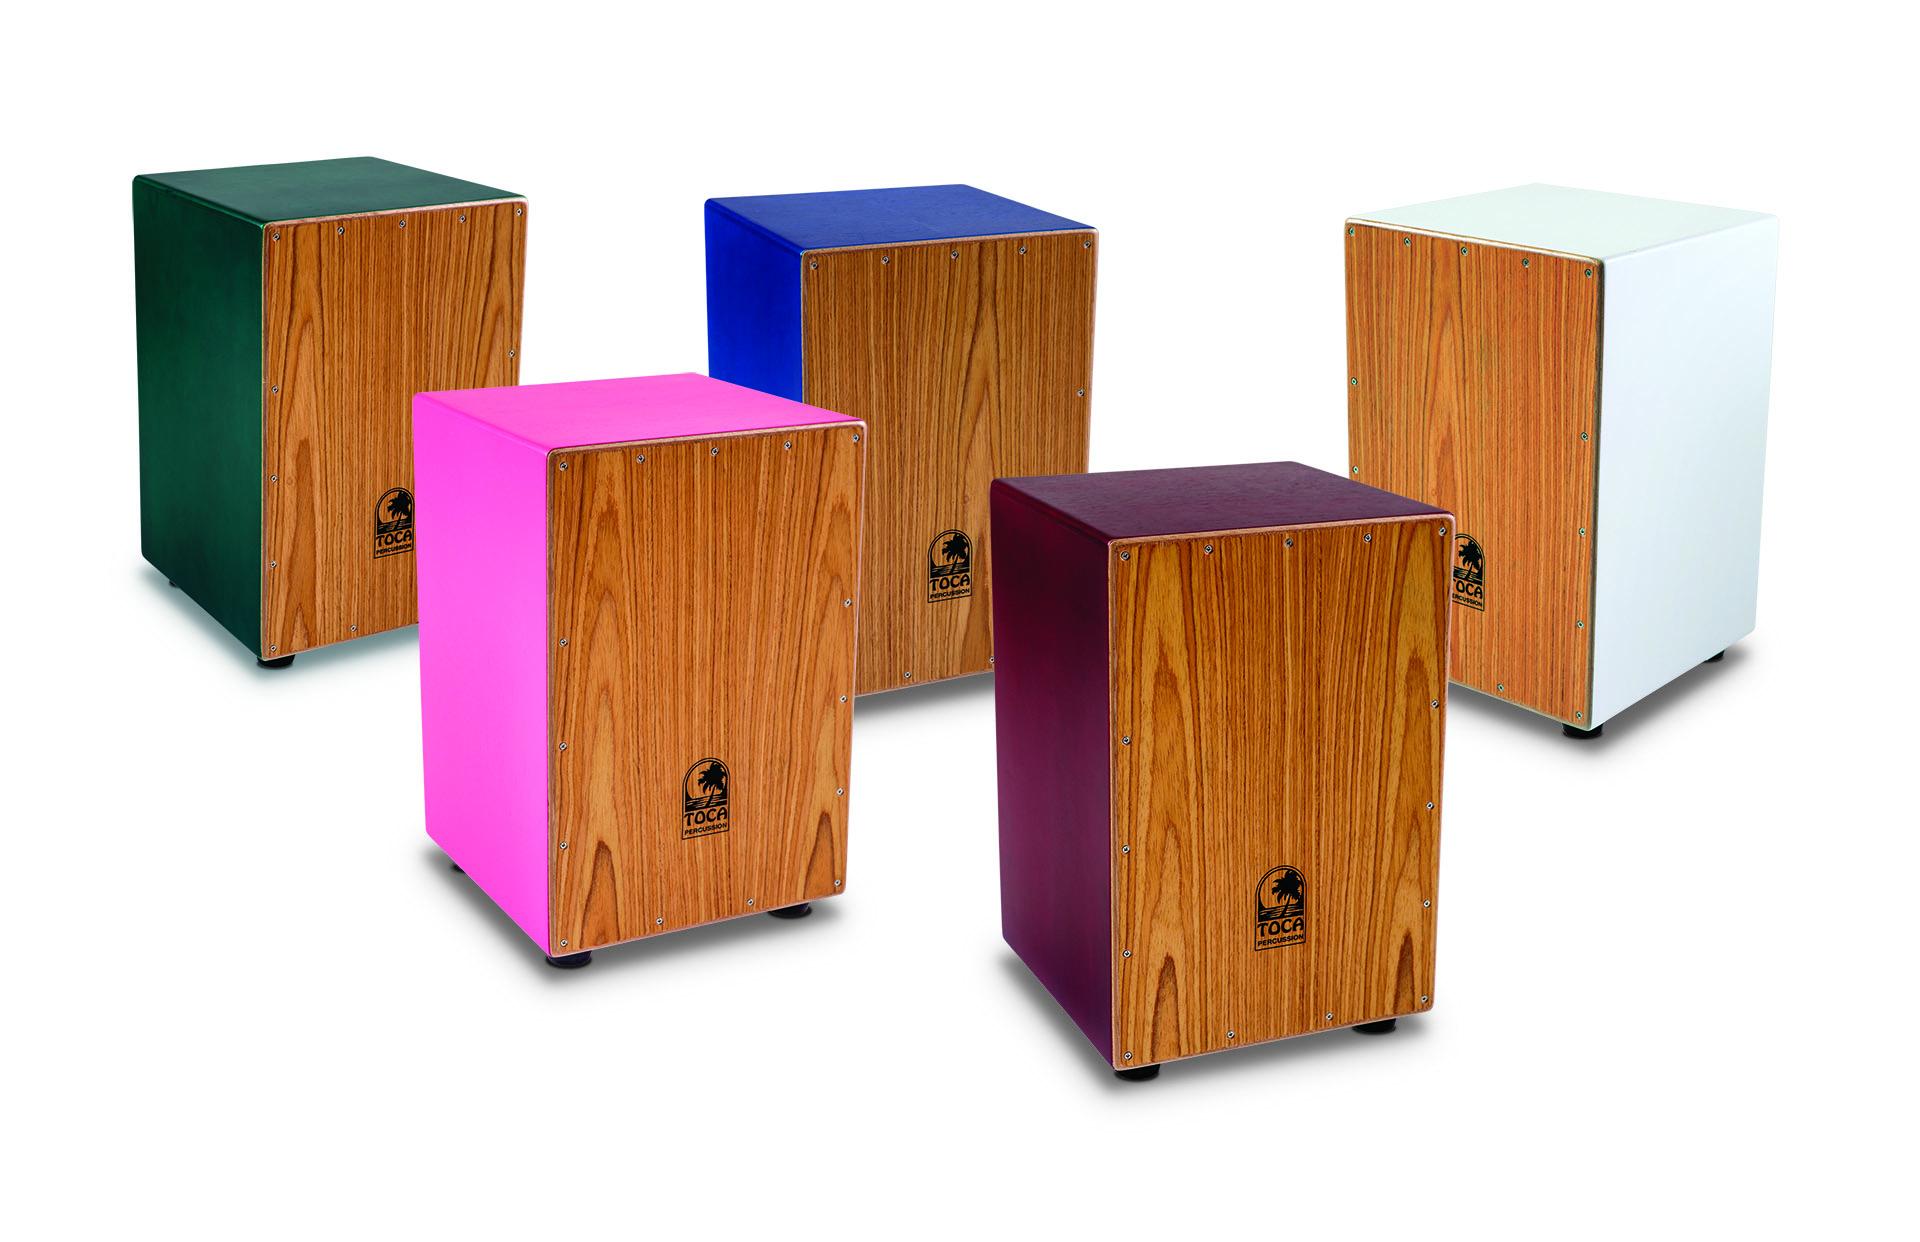 Showroom: Toca Introduces Entry-Level Colorsound Cajons